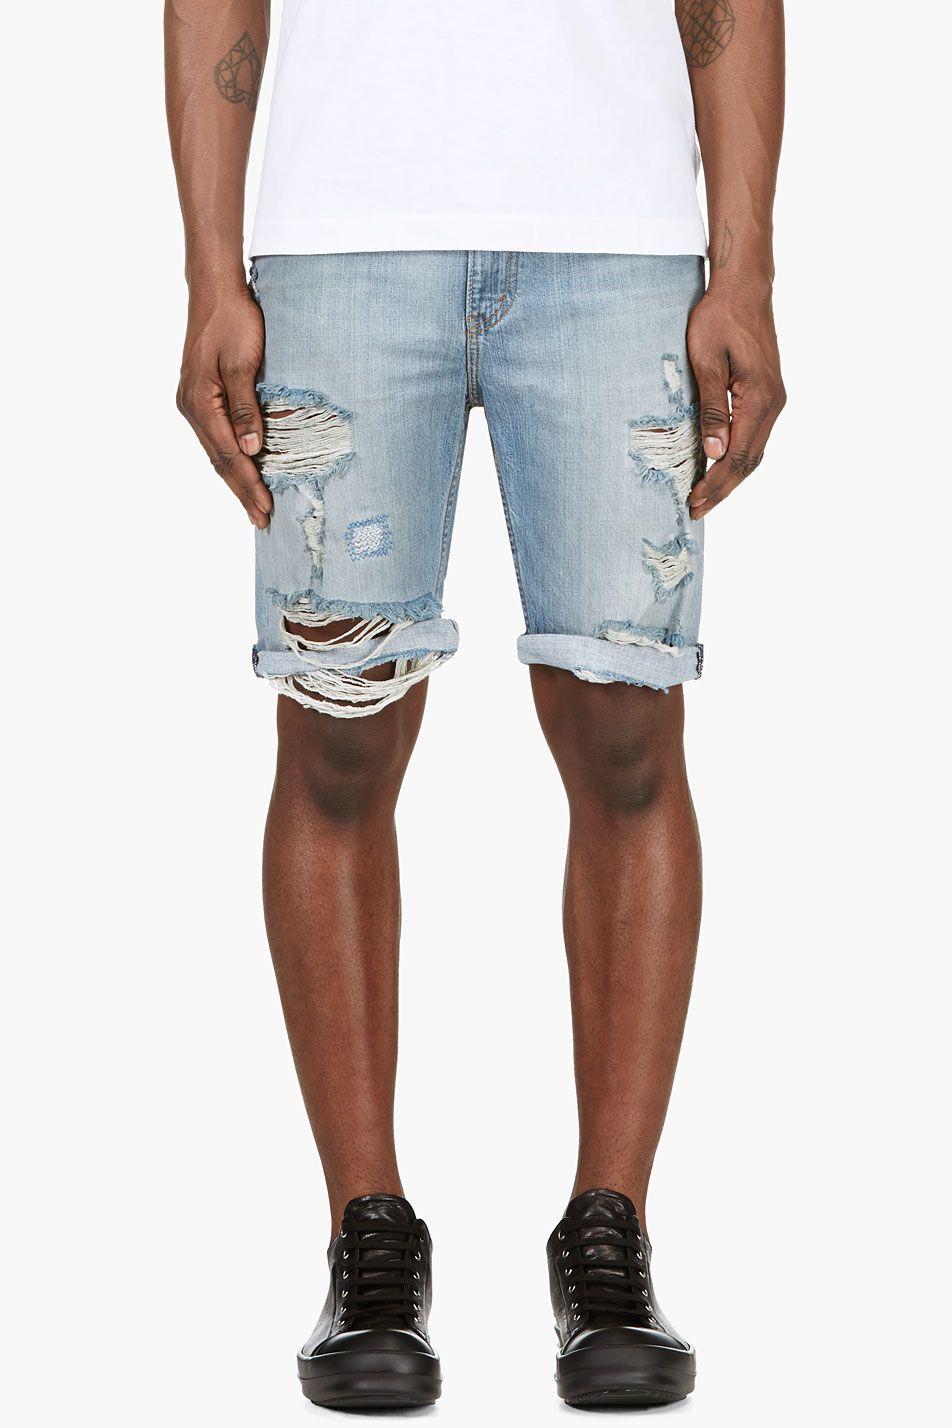 Black Jersey Shorts | Blue denim